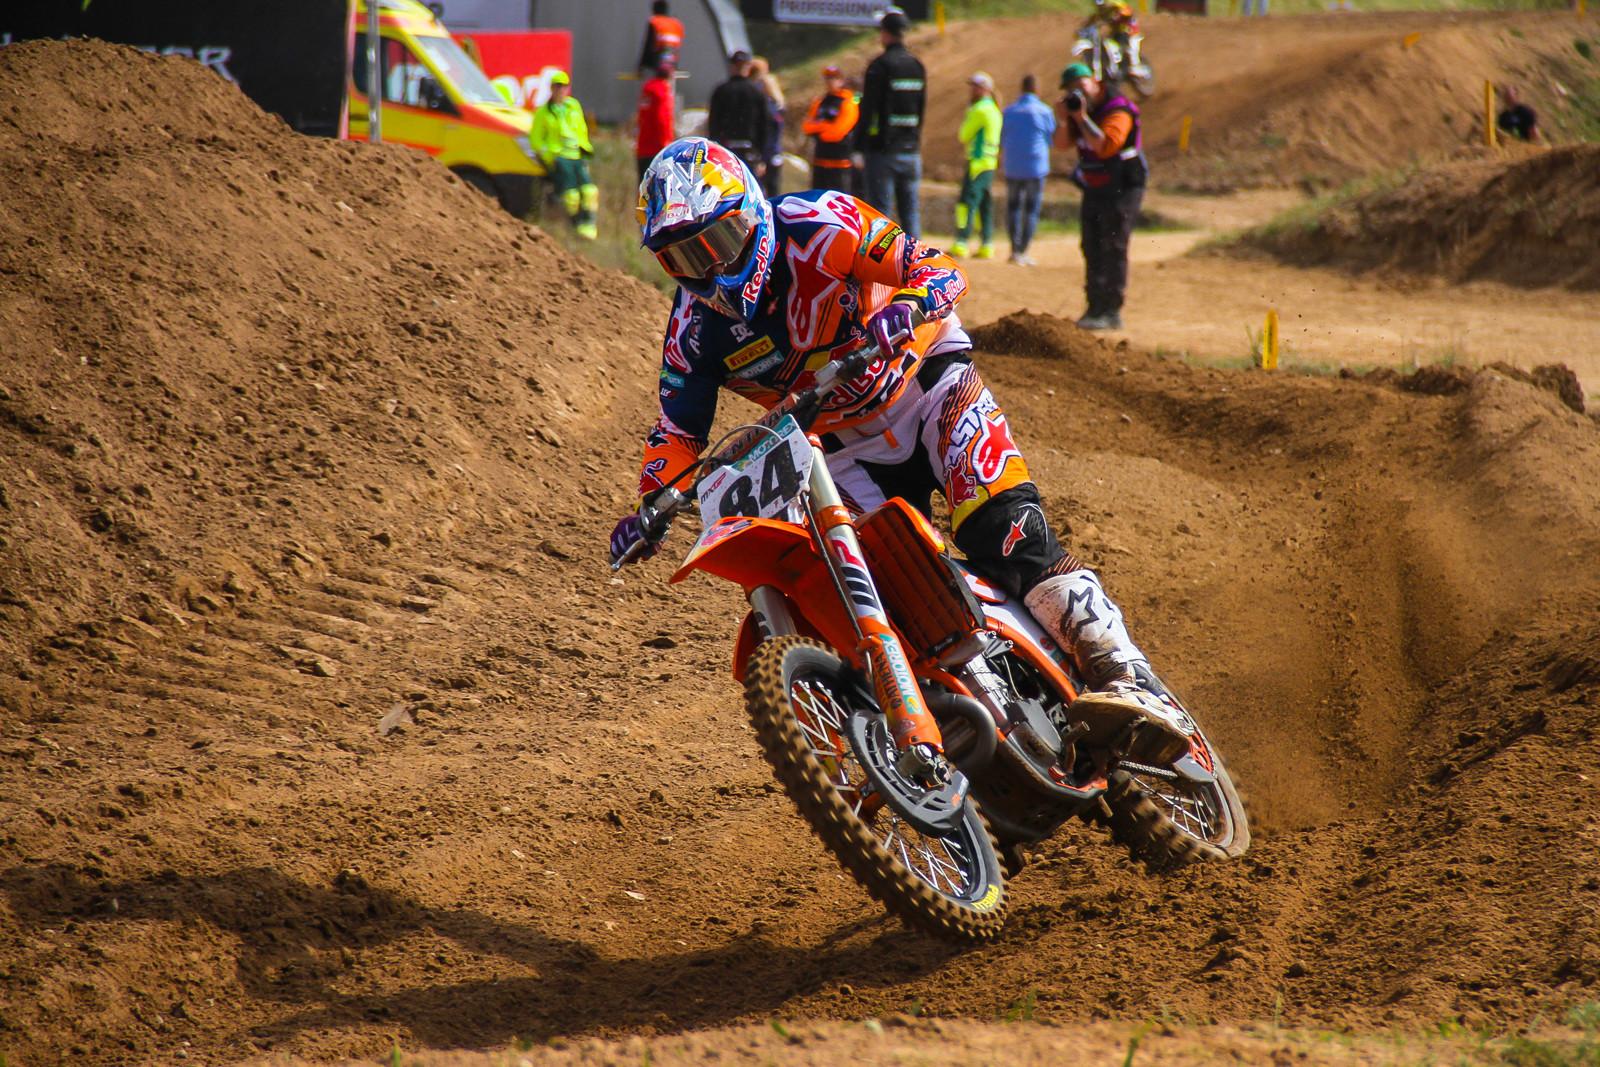 Jeffrey Herlings - Photo Blast: 2017 MXGP of Latvia - Motocross Pictures - Vital MX